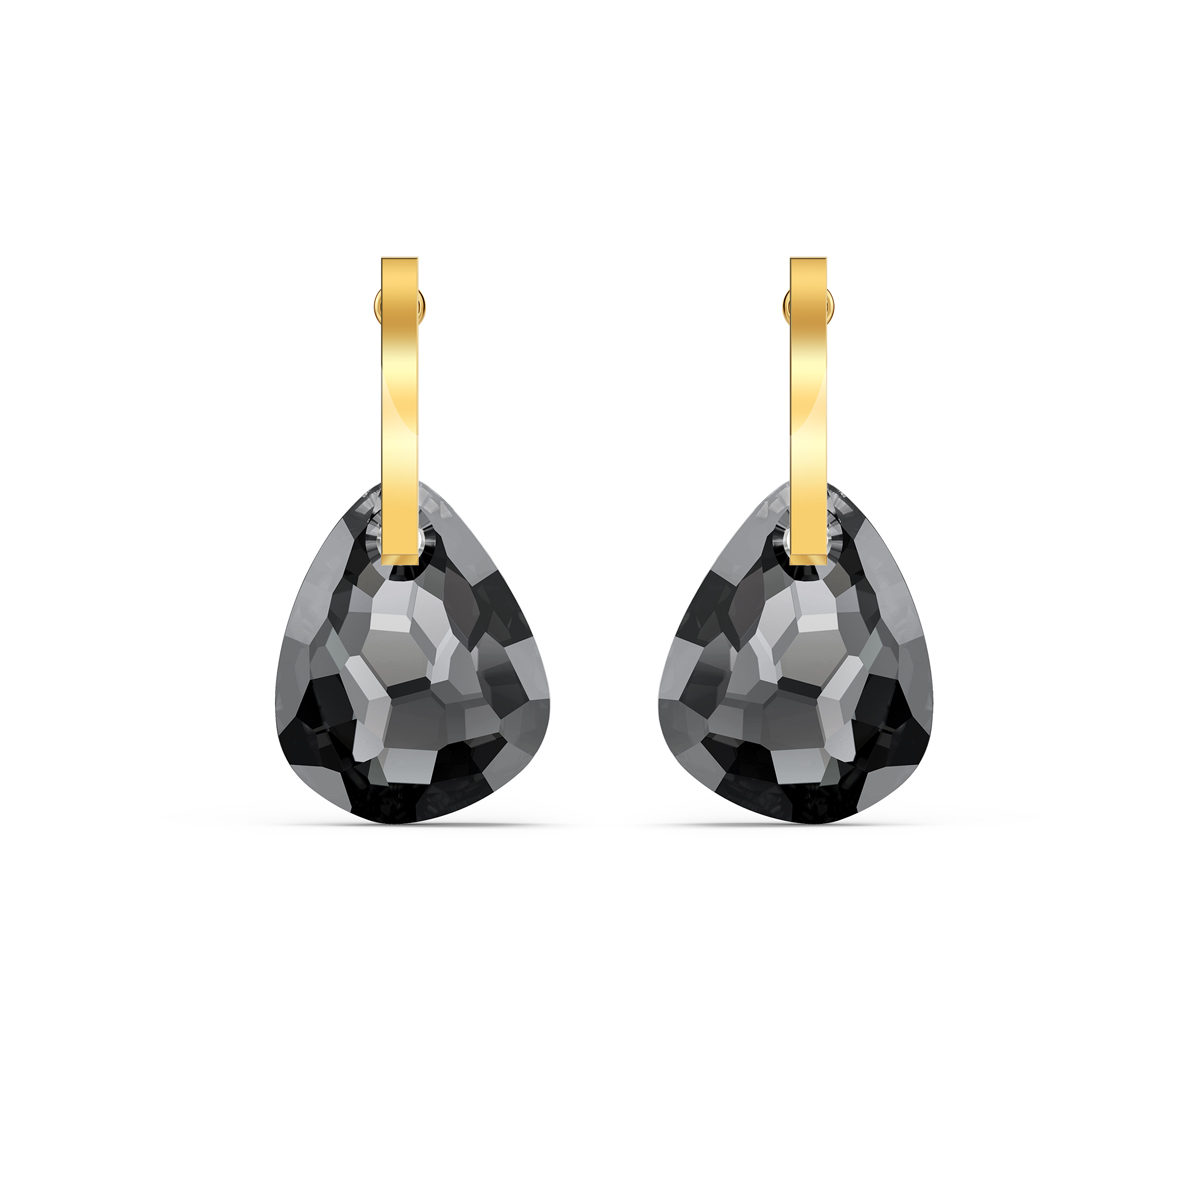 Swarovski T Bar Pierced Earrings, Gray, Gold Tone Plated